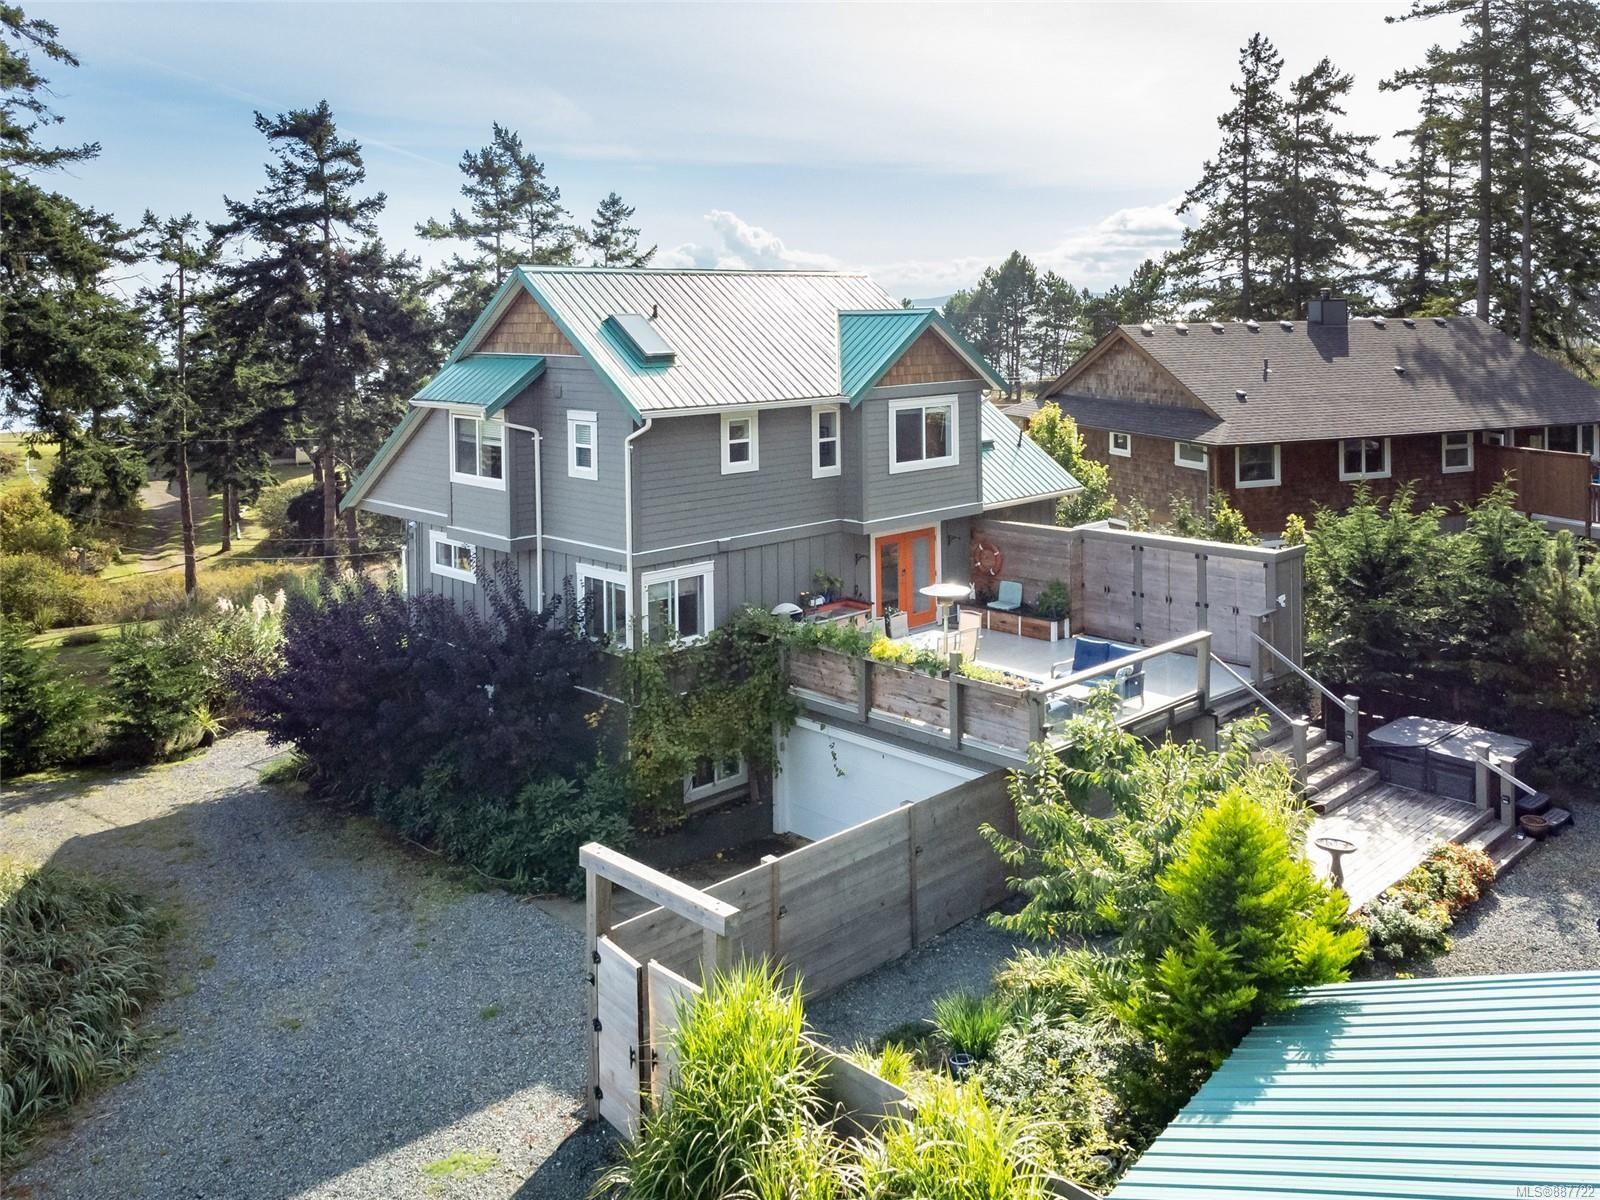 Main Photo: 495 Curtis Rd in Comox: CV Comox Peninsula House for sale (Comox Valley)  : MLS®# 887722